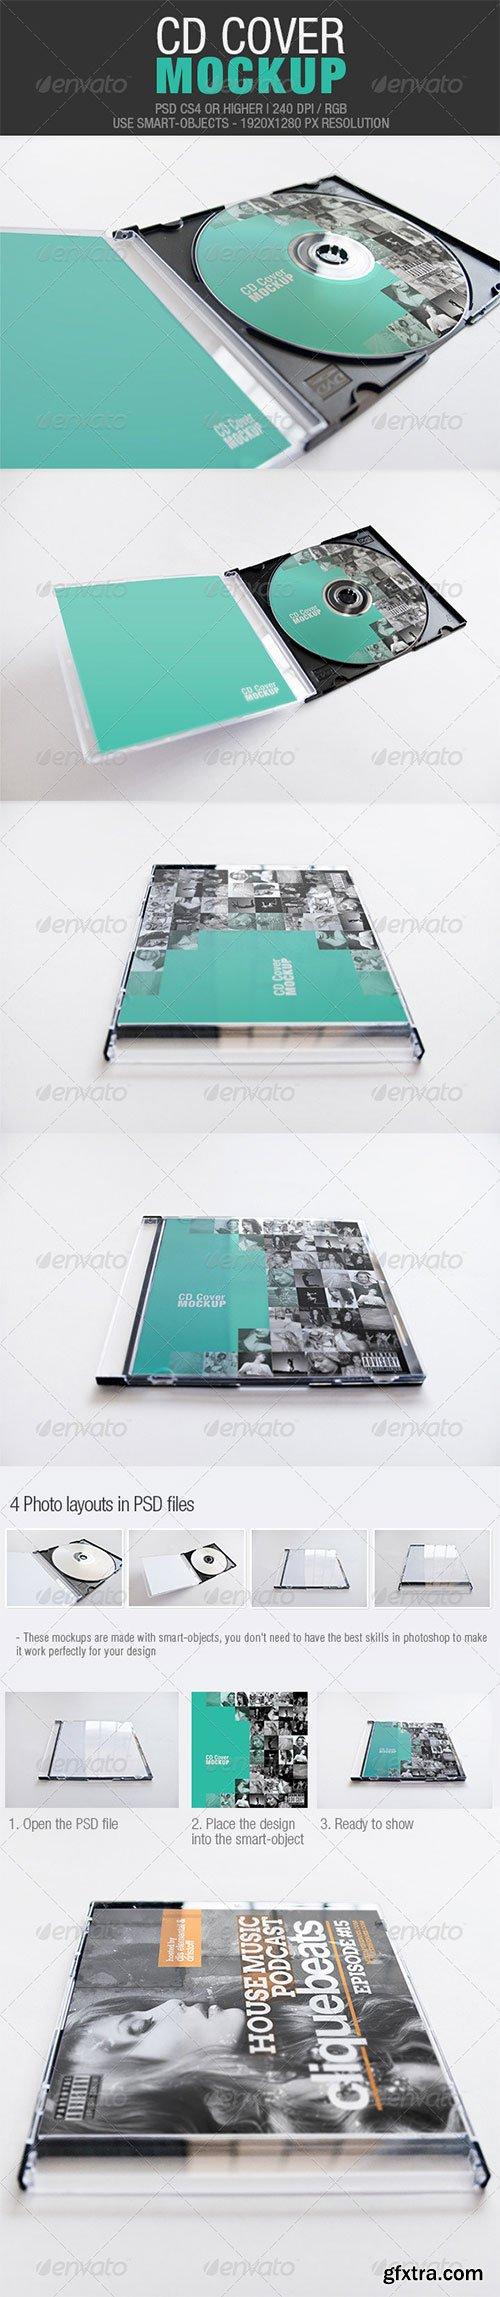 GraphicRiver - CD Cover Mockup 4244724